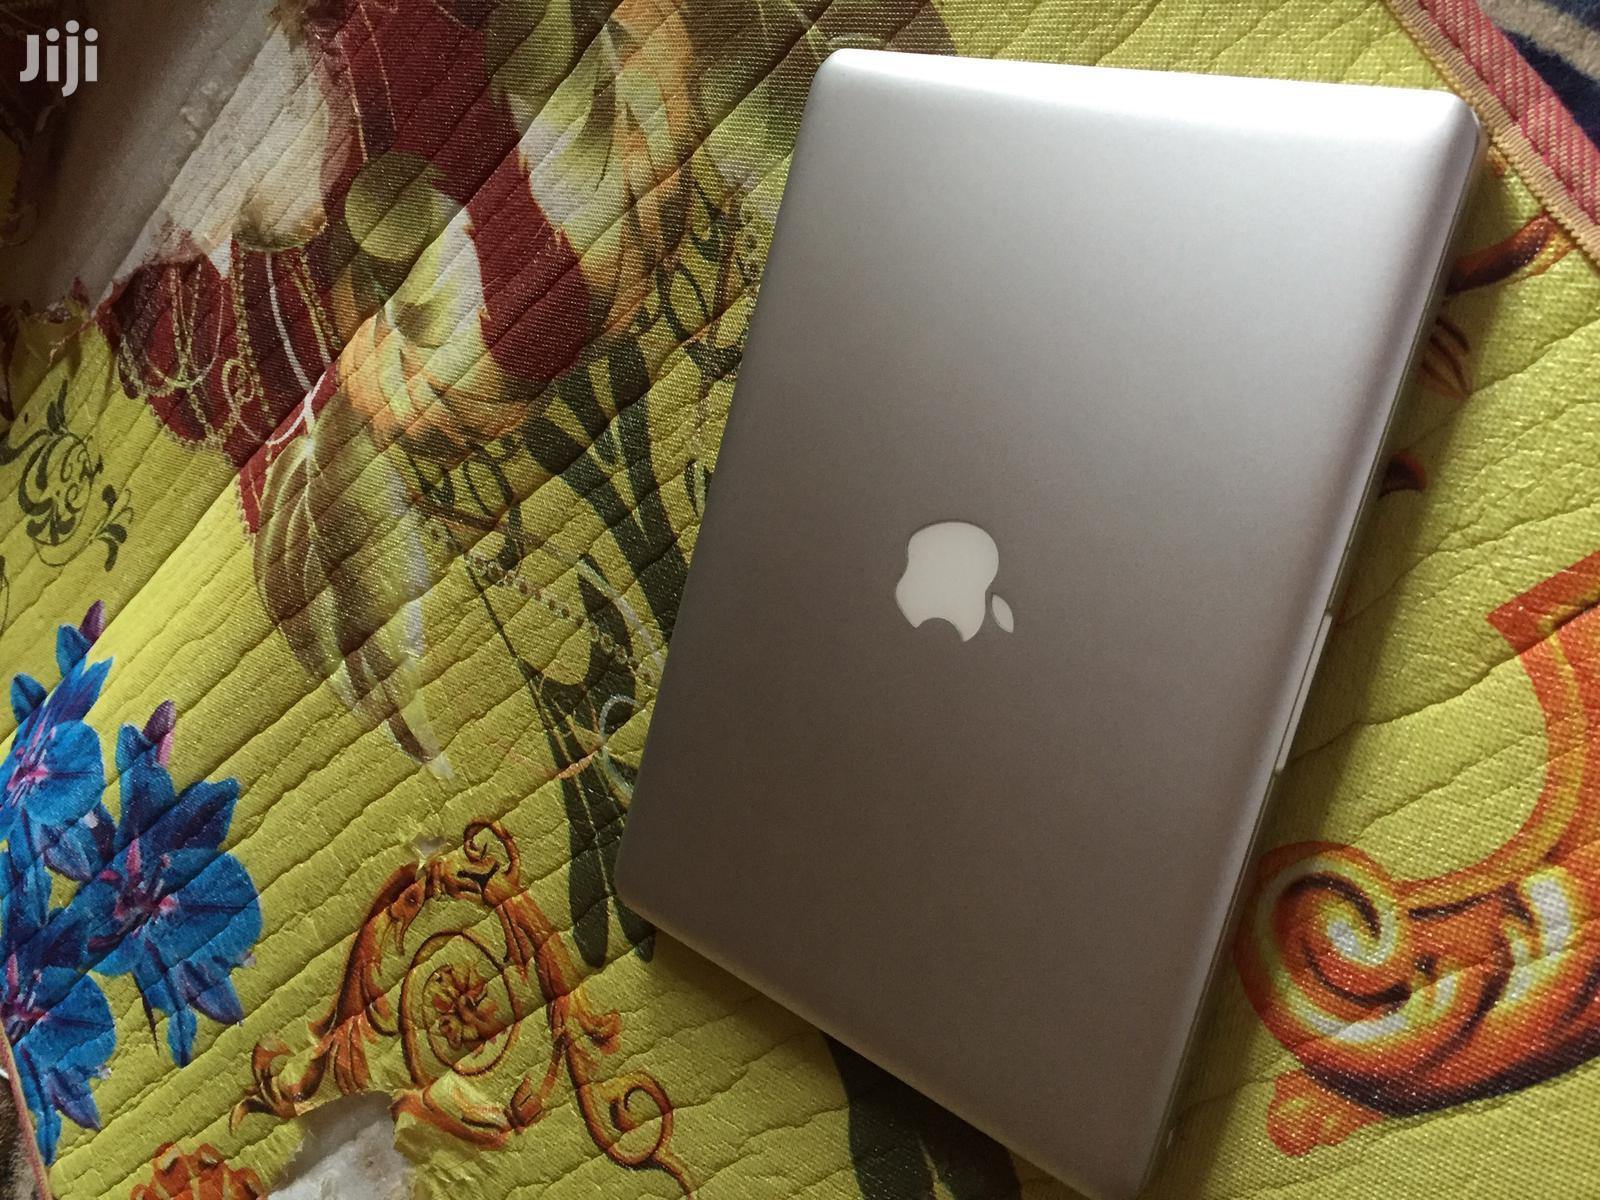 Laptop Apple MacBook Pro 4GB Intel Core I5 HDD 500GB | Laptops & Computers for sale in Kampala, Central Region, Uganda